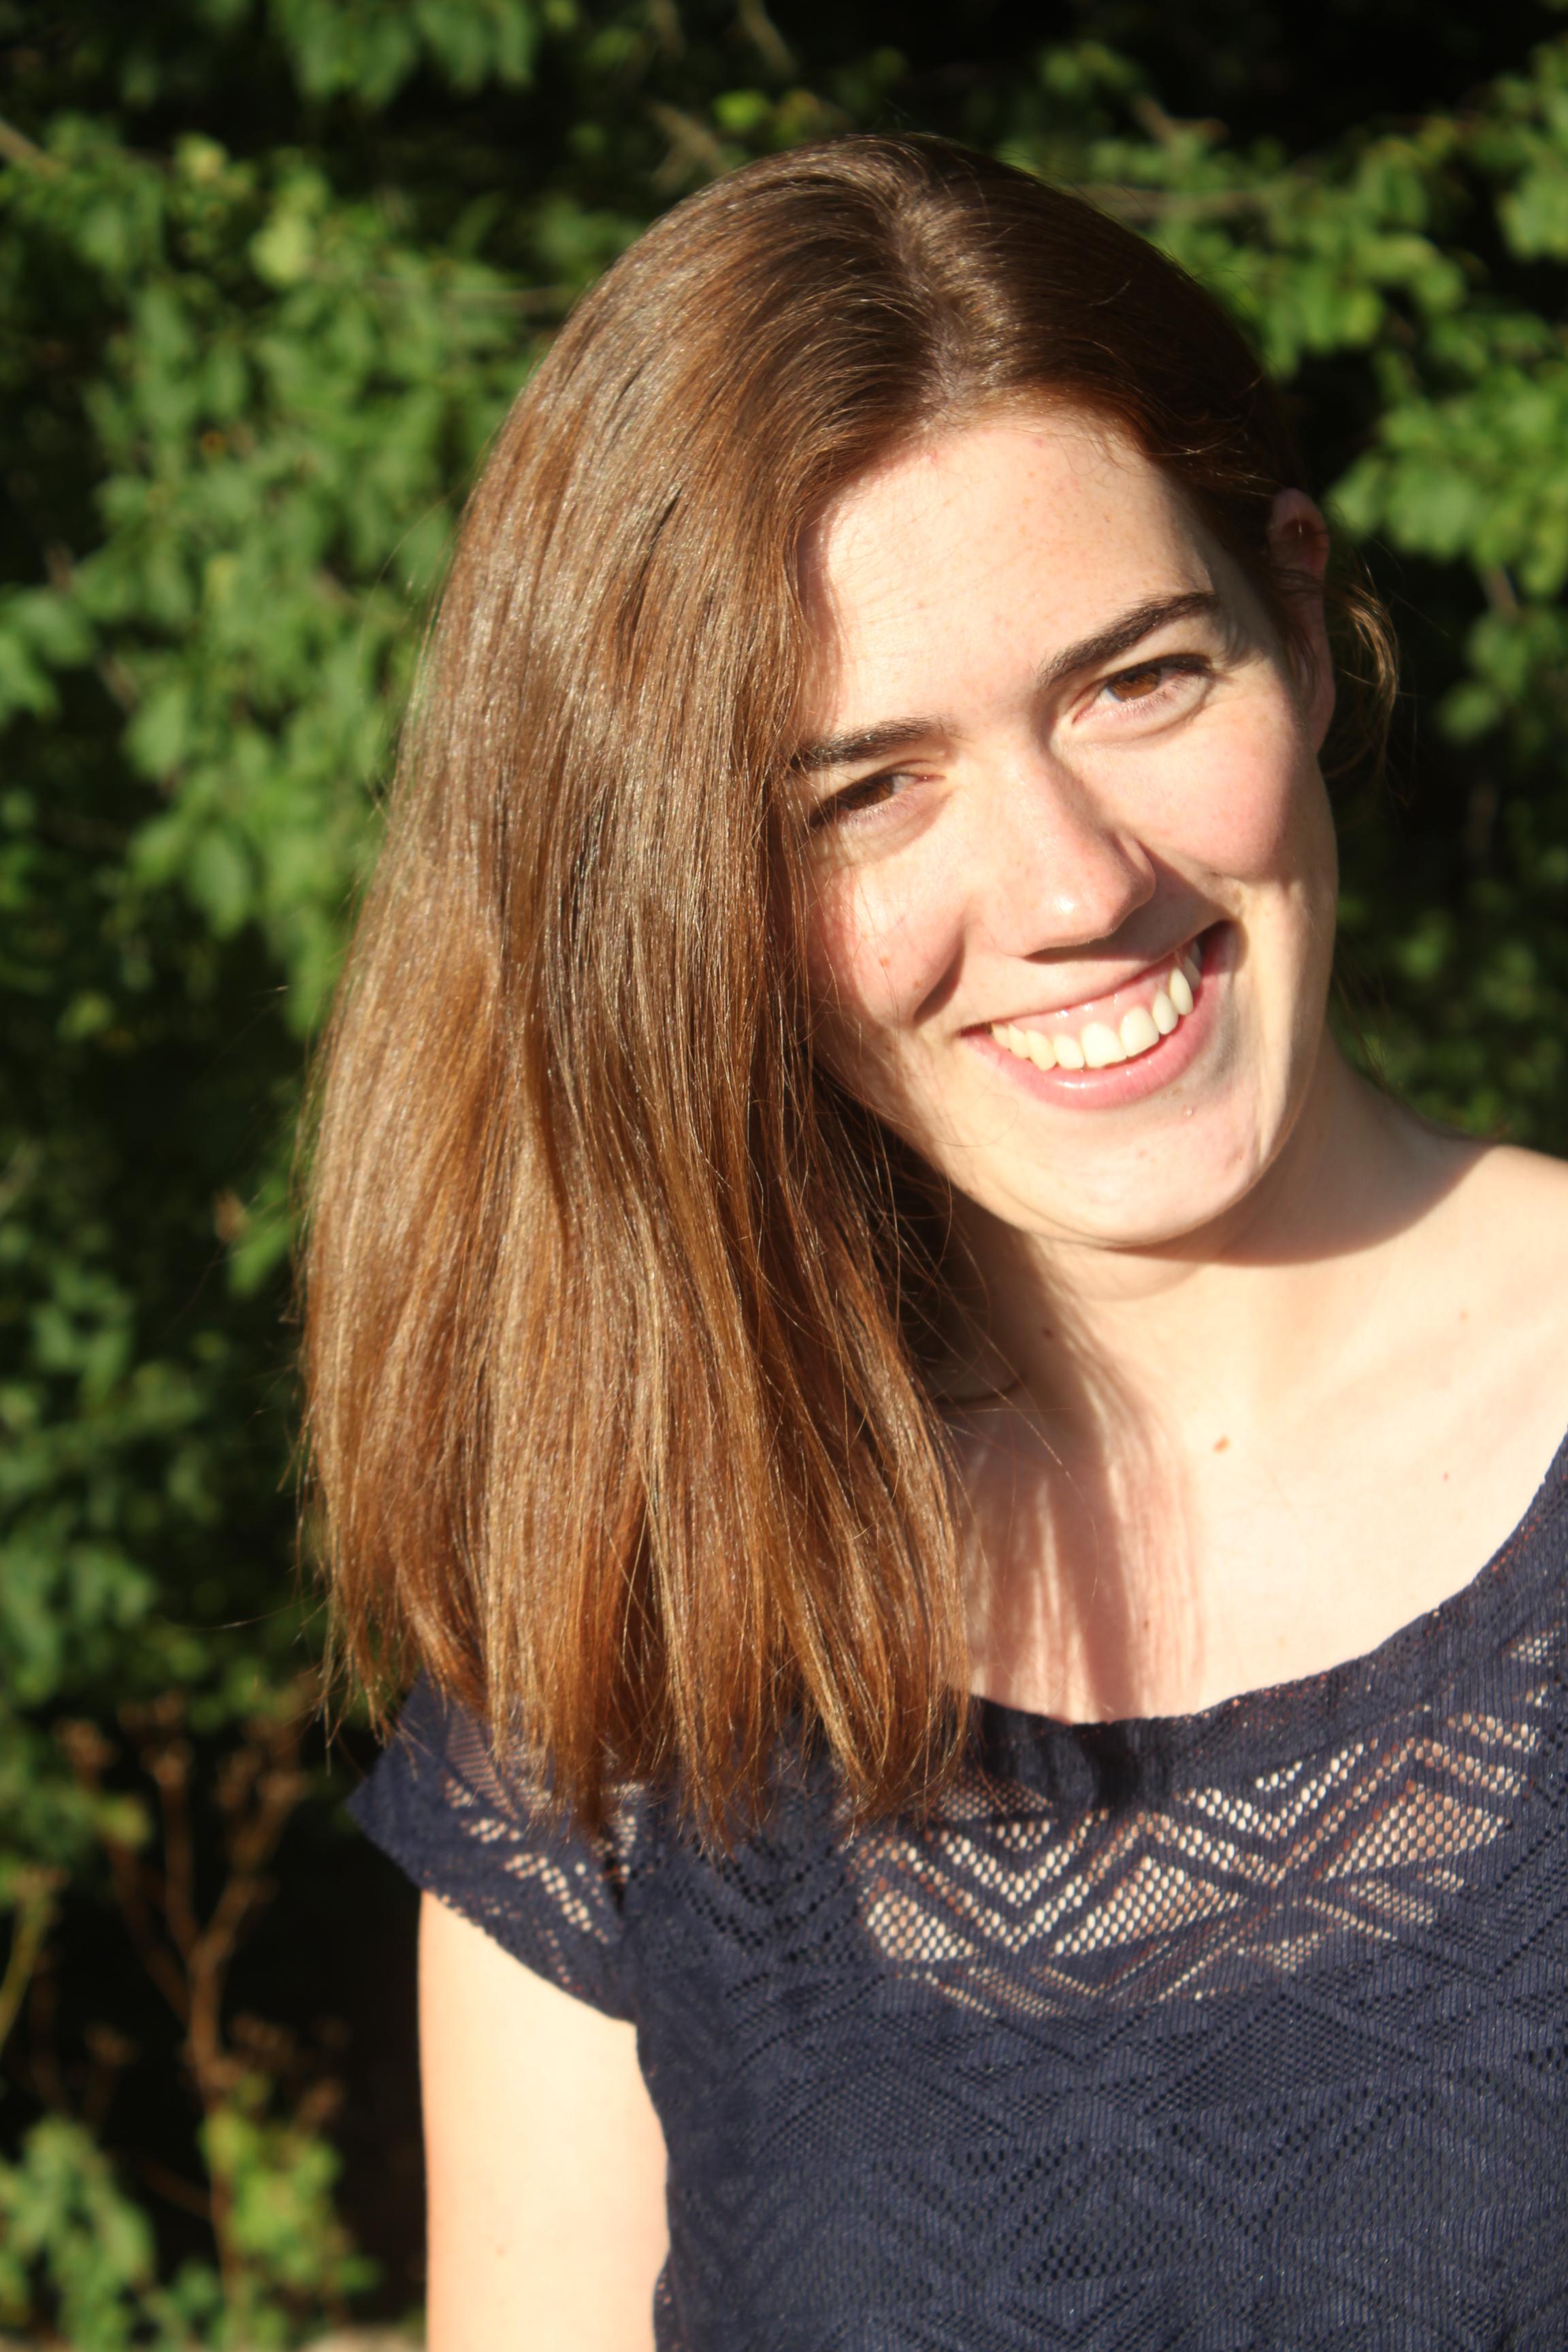 Hannah-Marie Heine